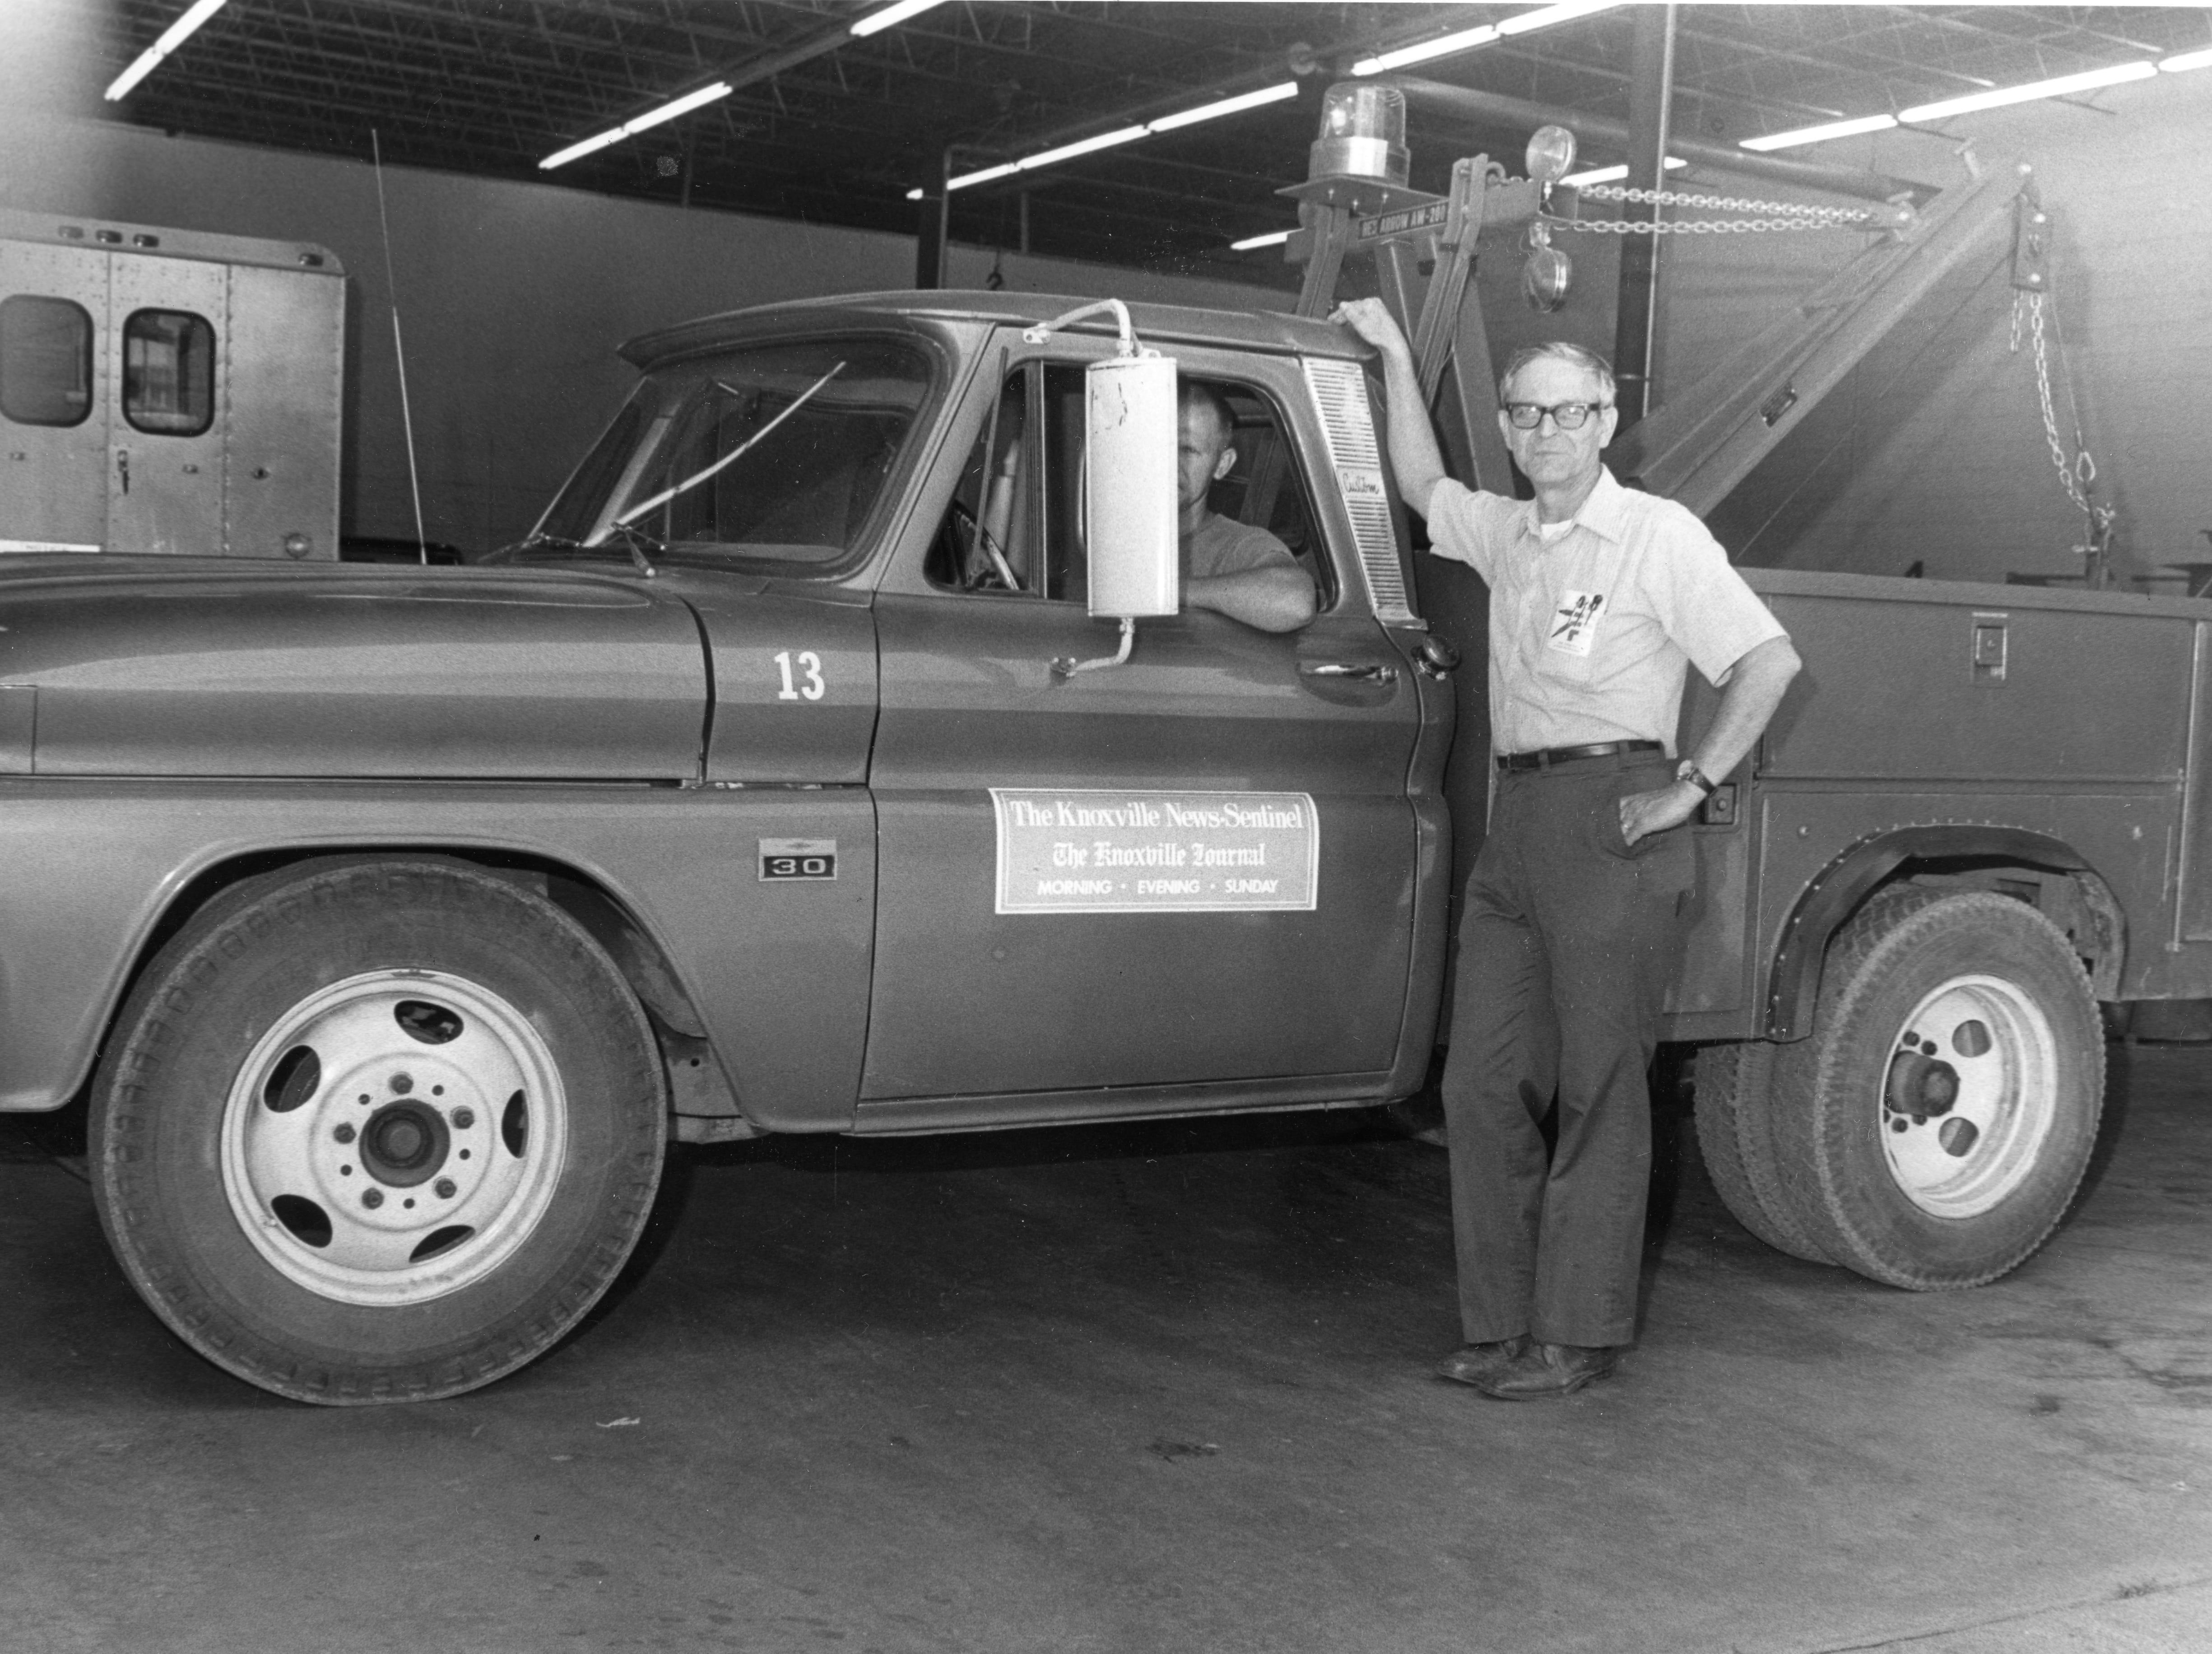 Roland Ball and R.B. Burnette, Garage Supervisor, of the News Sentinel.